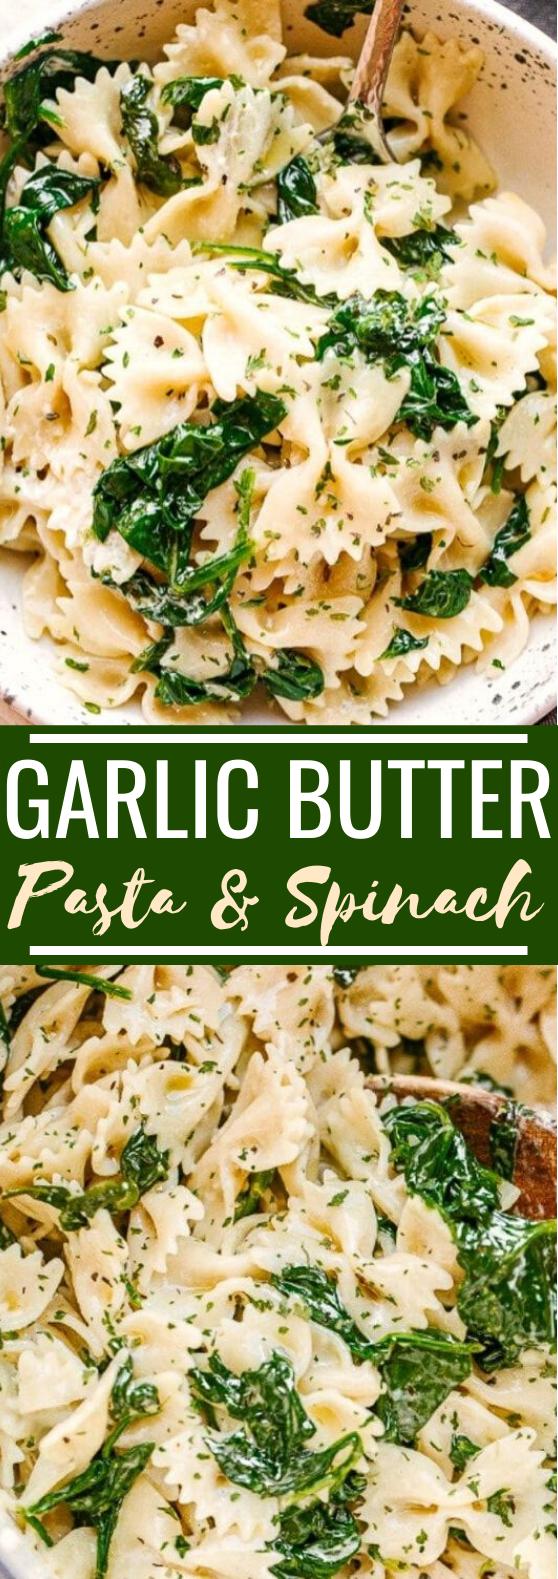 Creamy Garlic Butter Pasta with Spinach #dinner #pasta #vegetarian #spinach #recipes